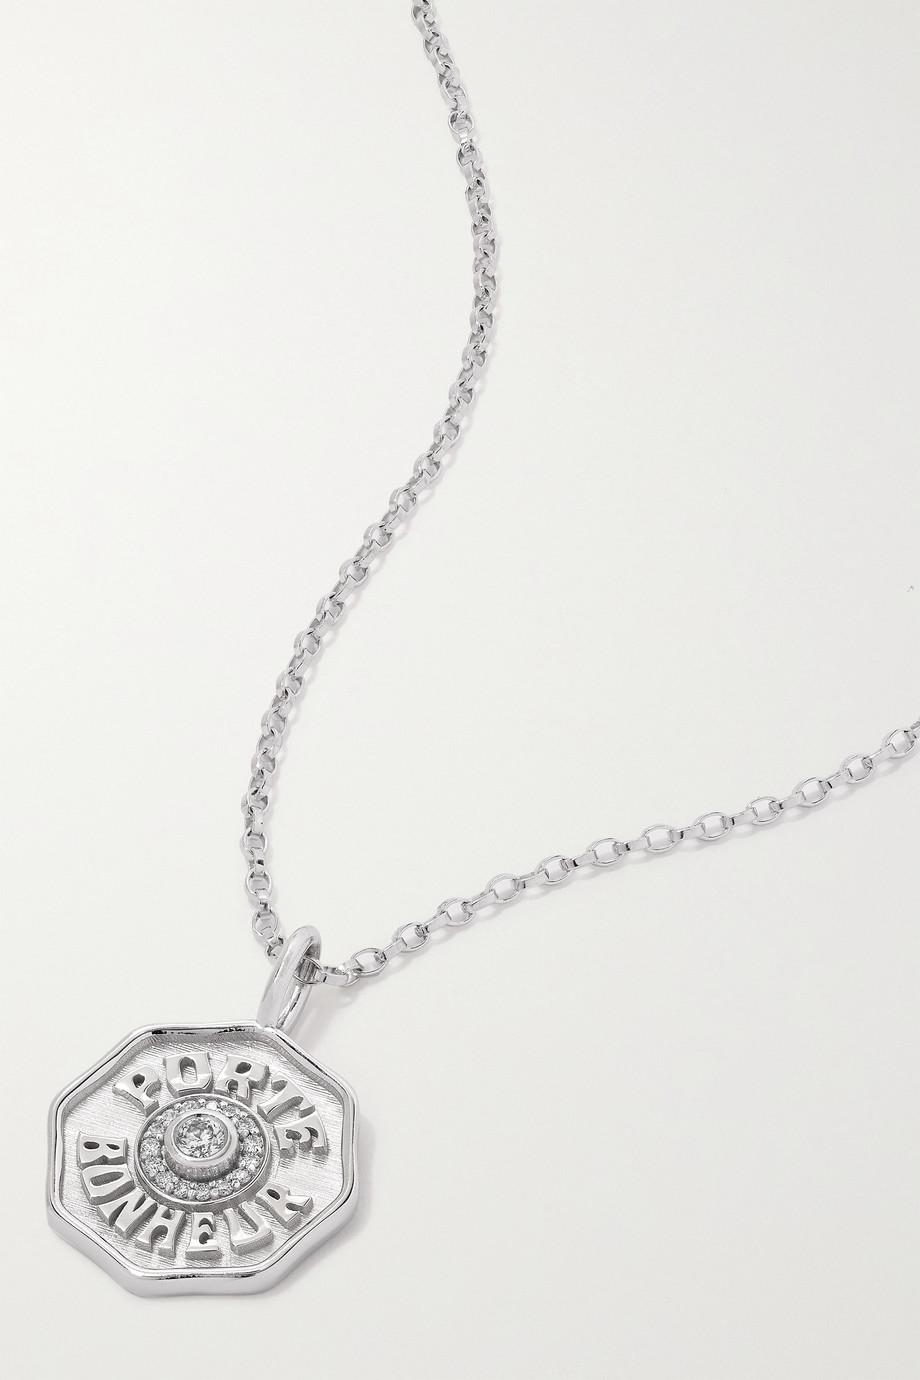 Marlo Laz Mini Porte Bonheur 14-karat white gold, enamel and diamond necklace